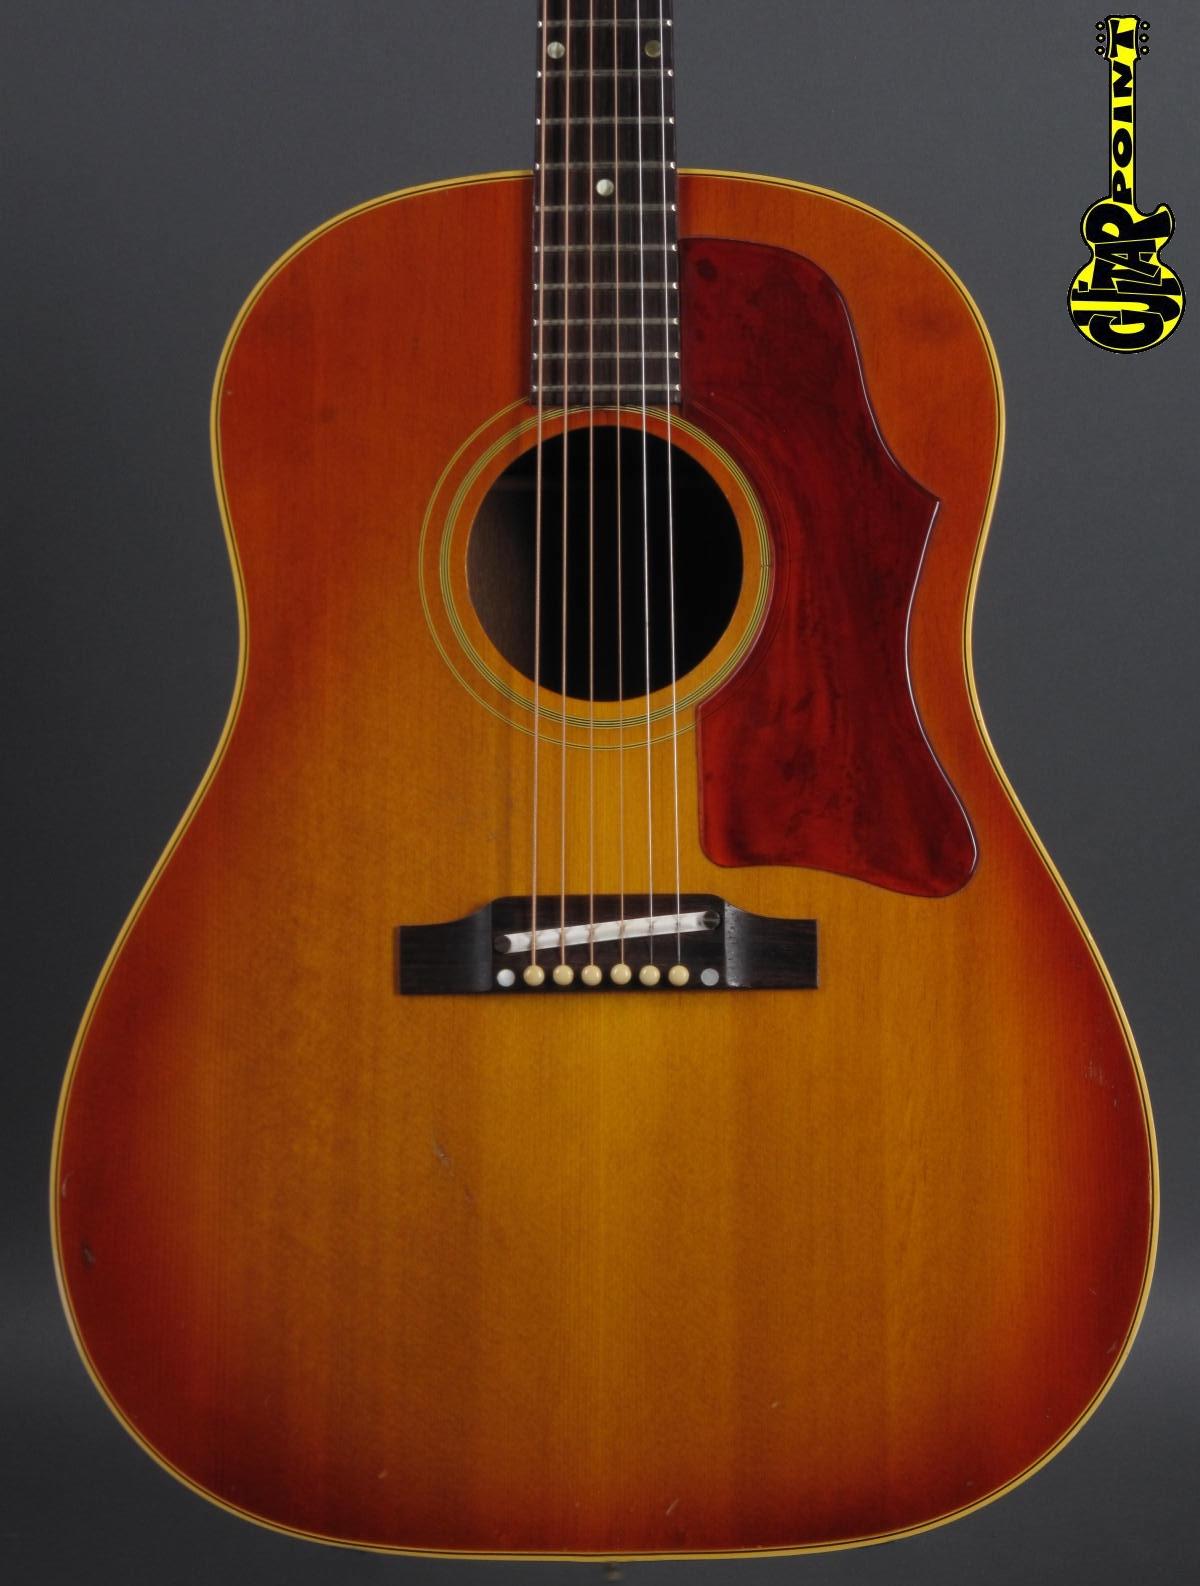 1965 Gibson J-45 - Cherry Sunburst